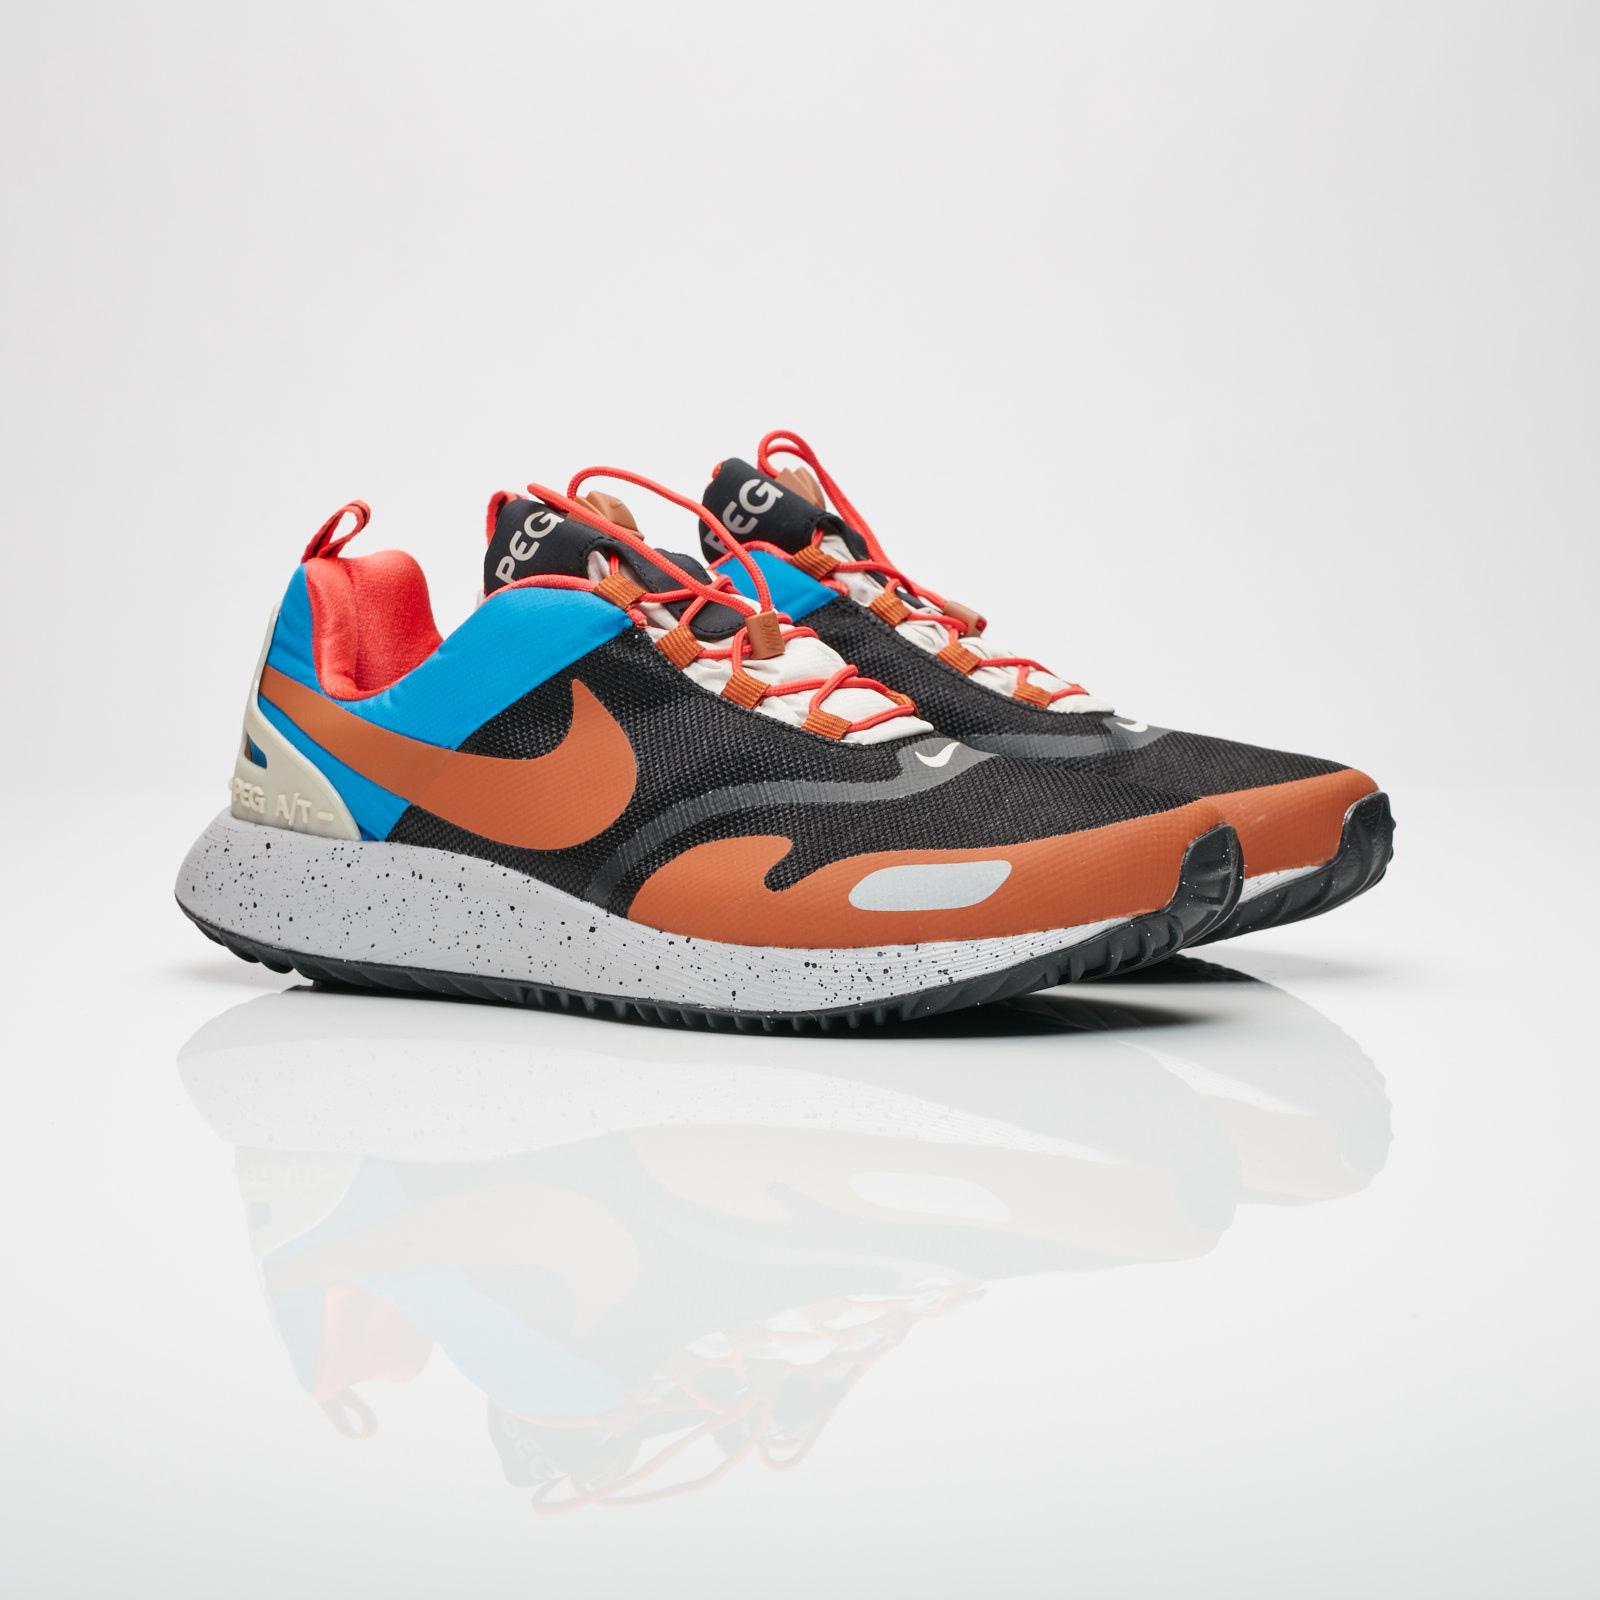 c2e124e1e53d Nike Air Pegasus A T Winter QS - Ao3296-001 - Sneakersnstuff ...